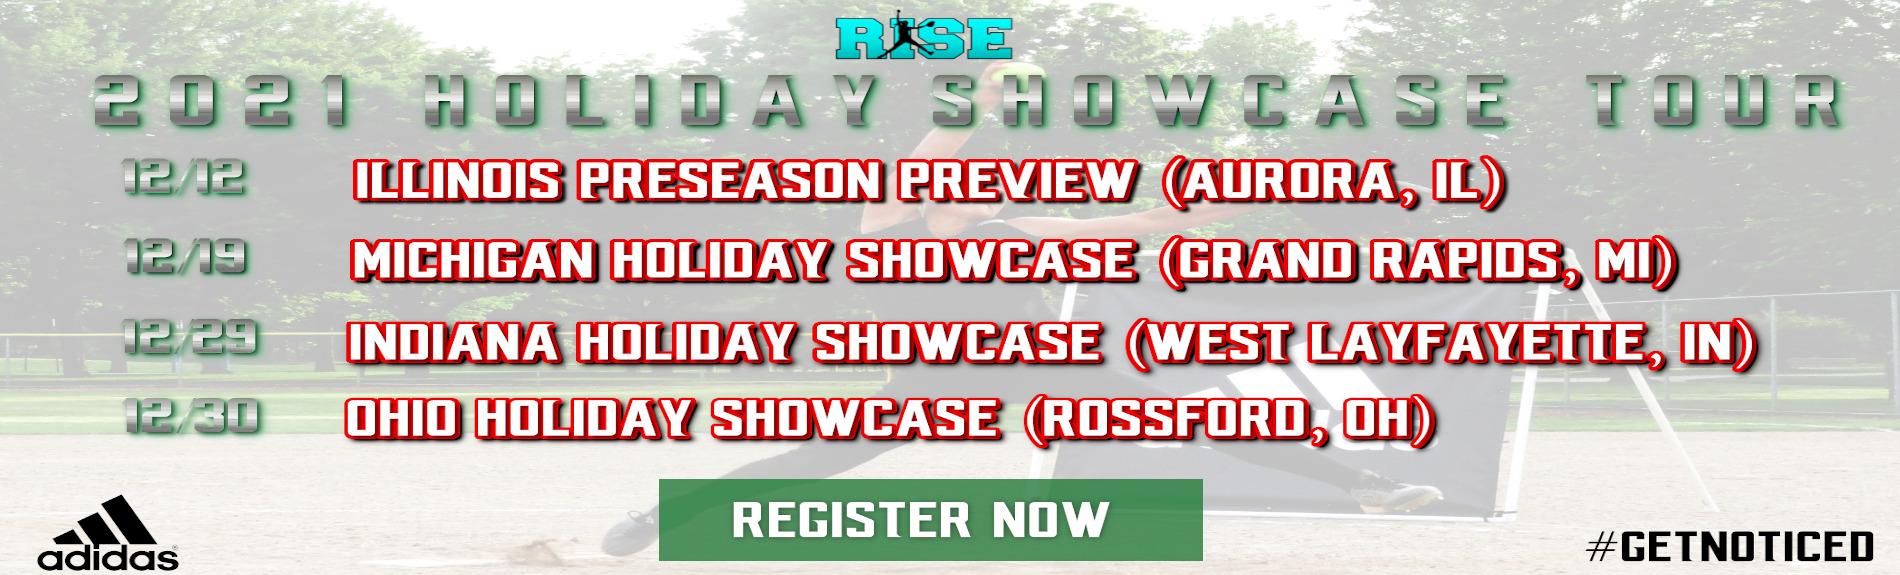 2021 RISE-Holiday Showcase Tour